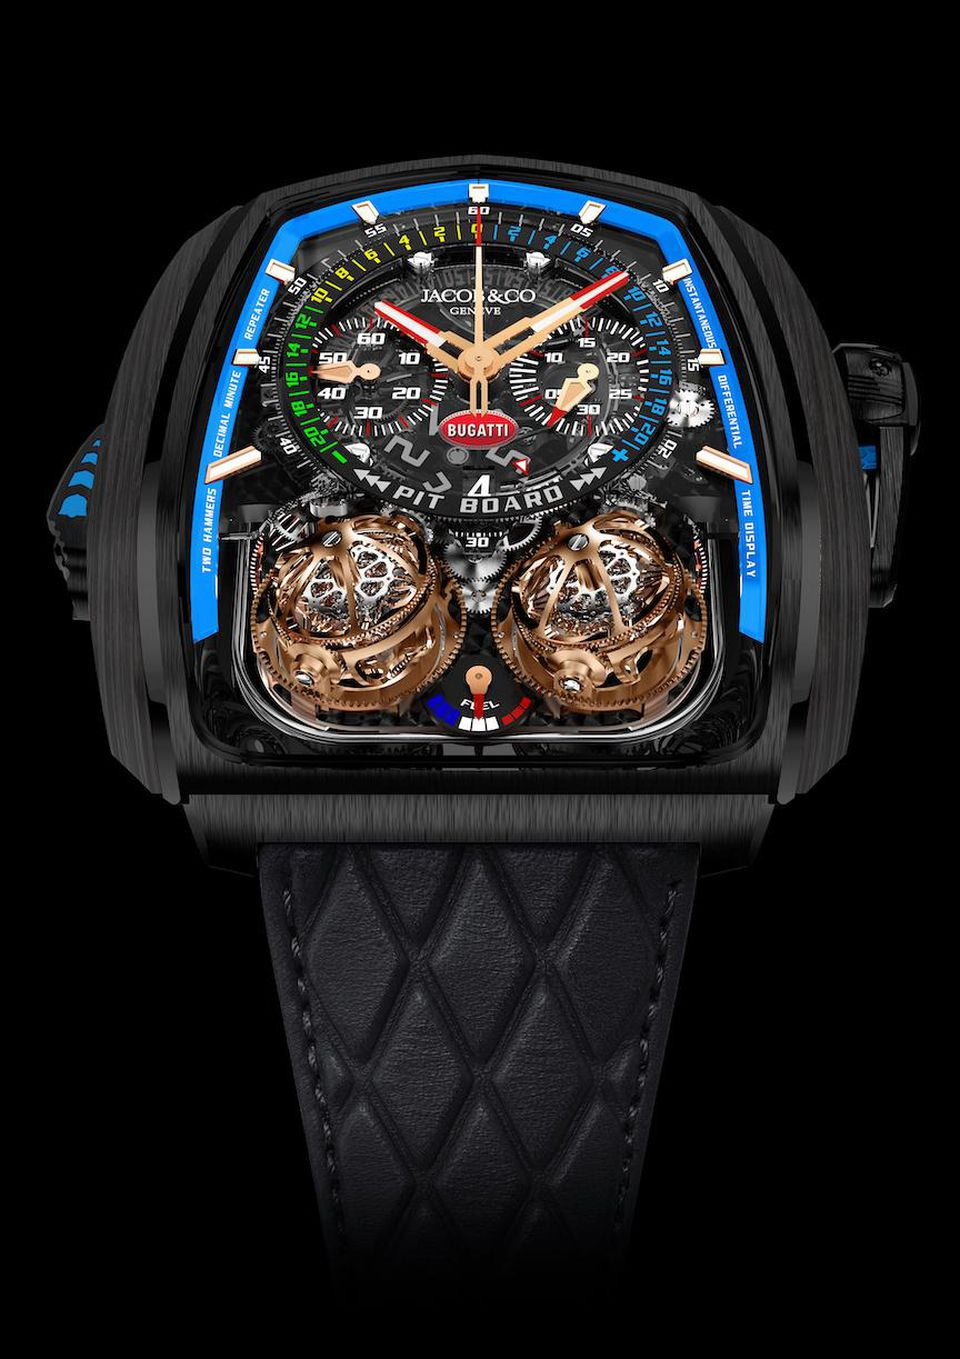 Relógio Jacob & Co.